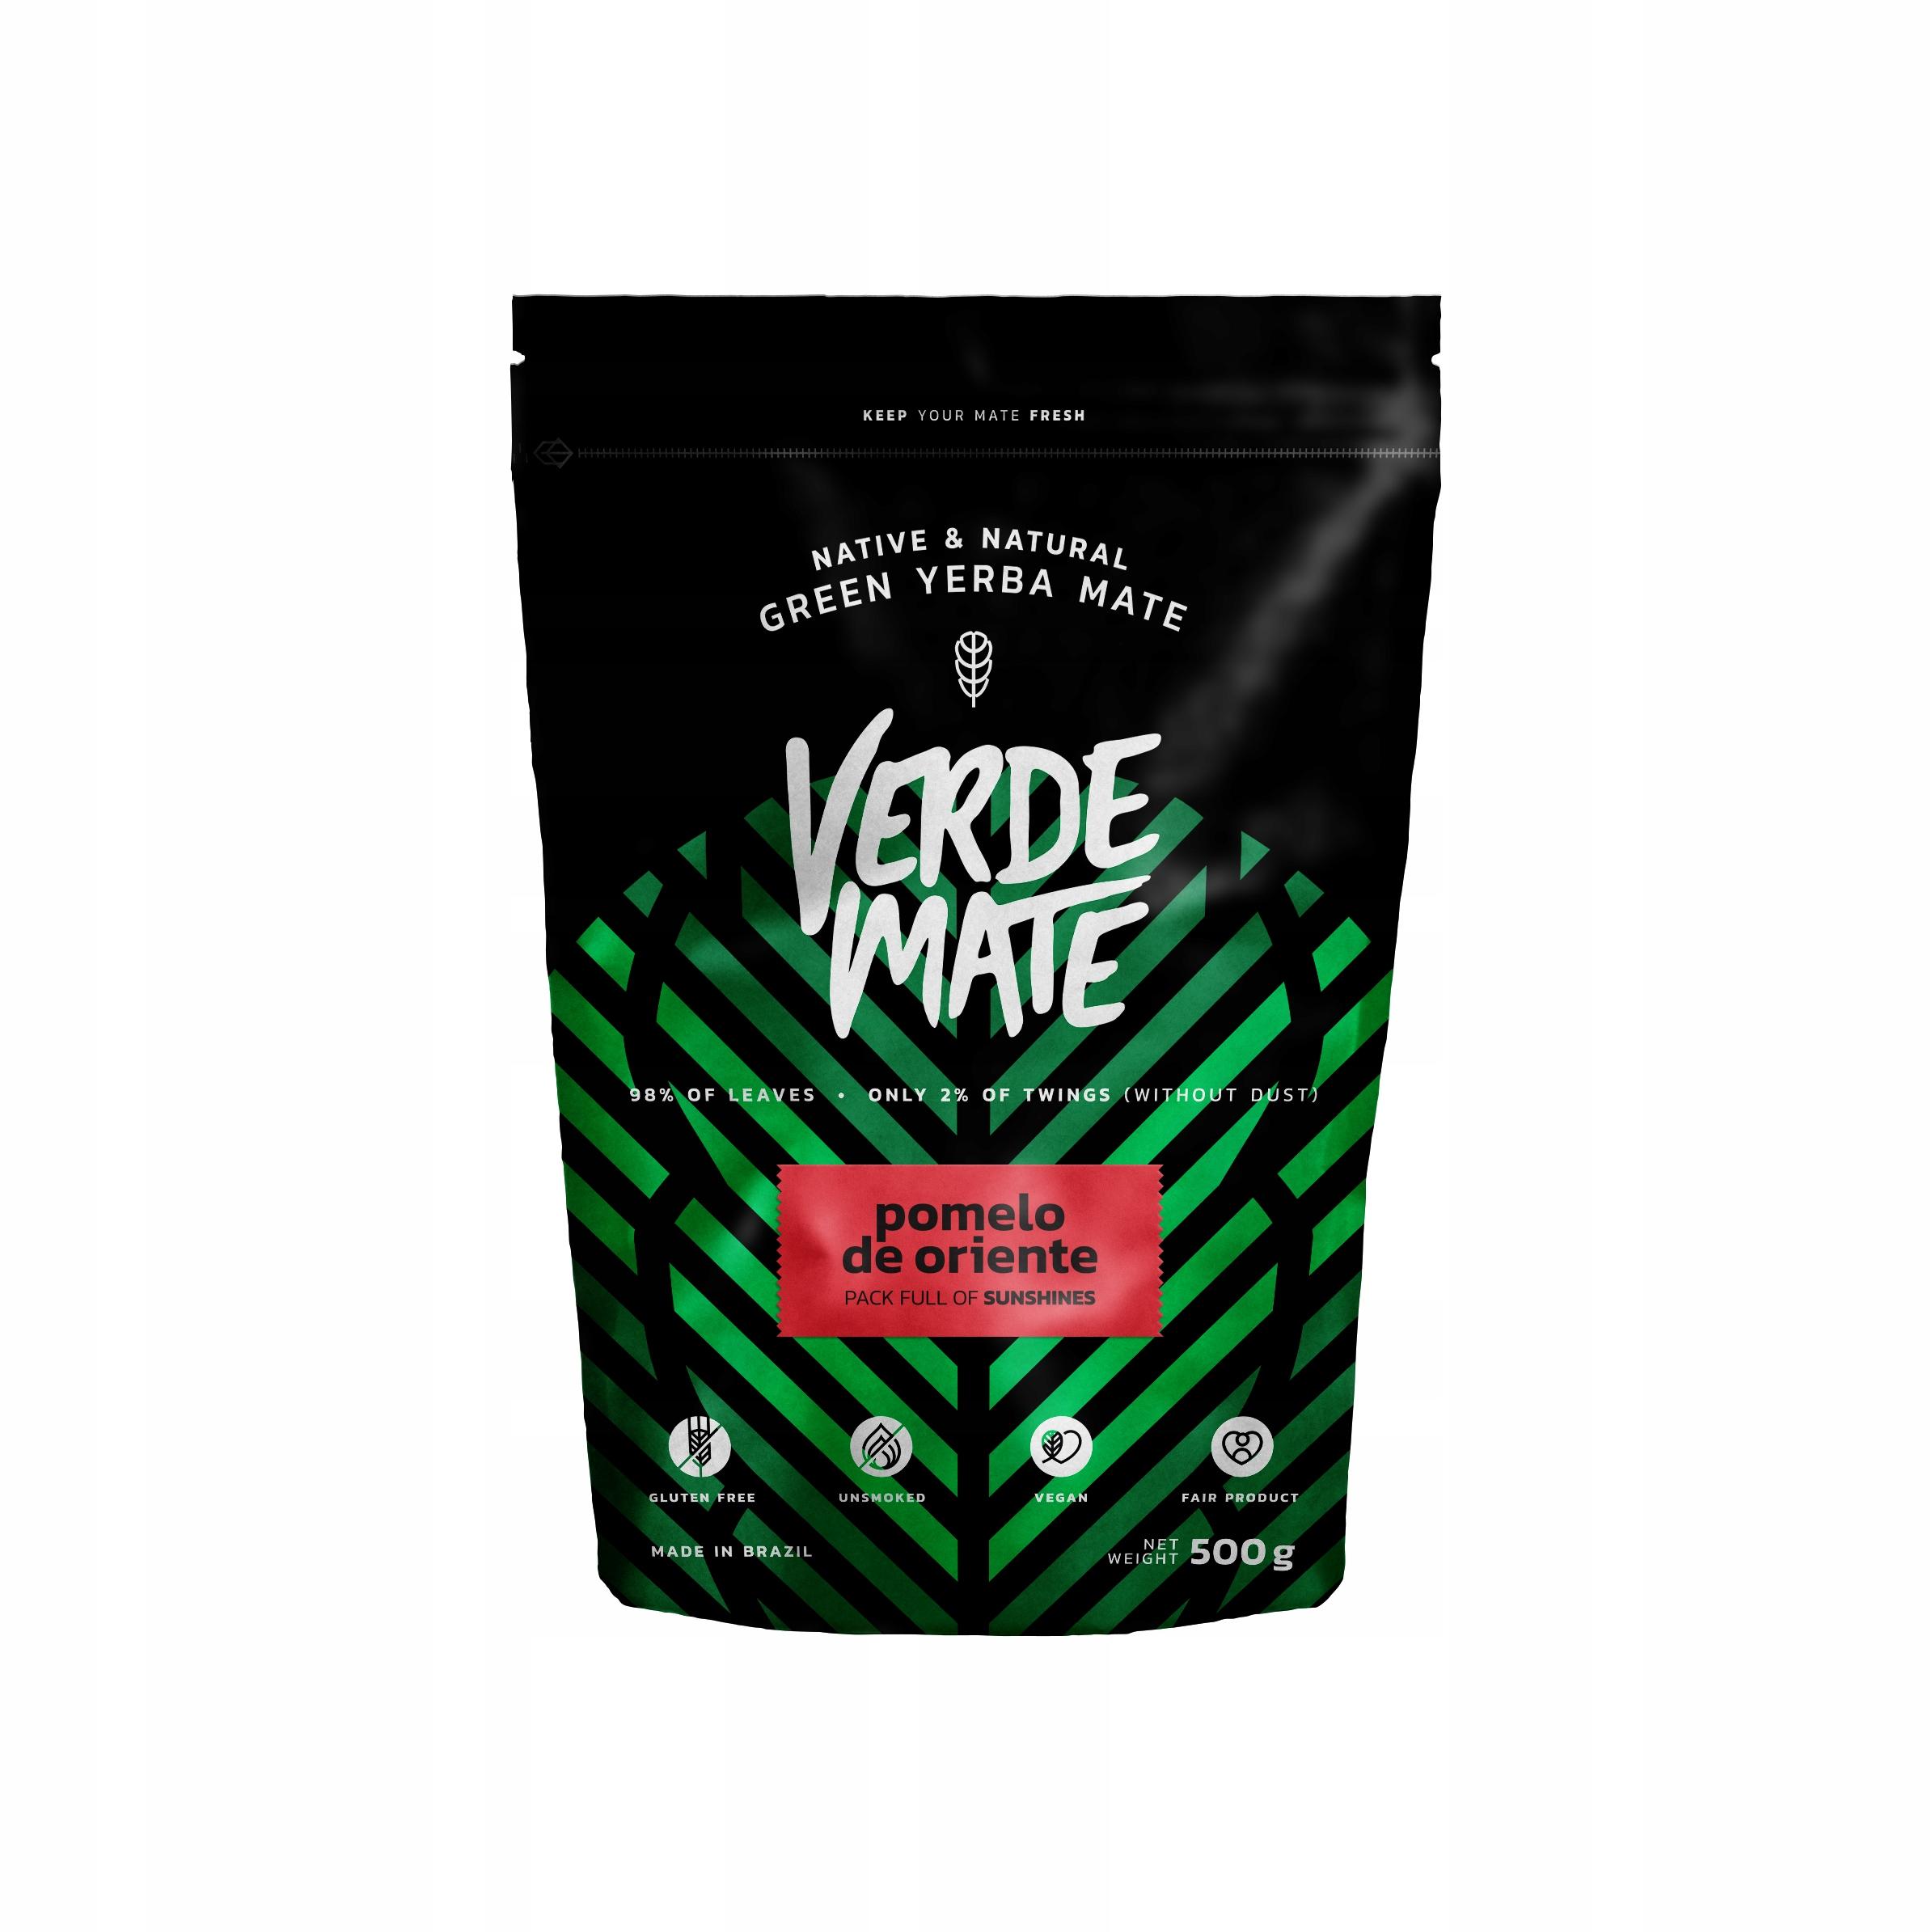 Yerba Verde Mate Green Pomelo De Oriente 0,5kg